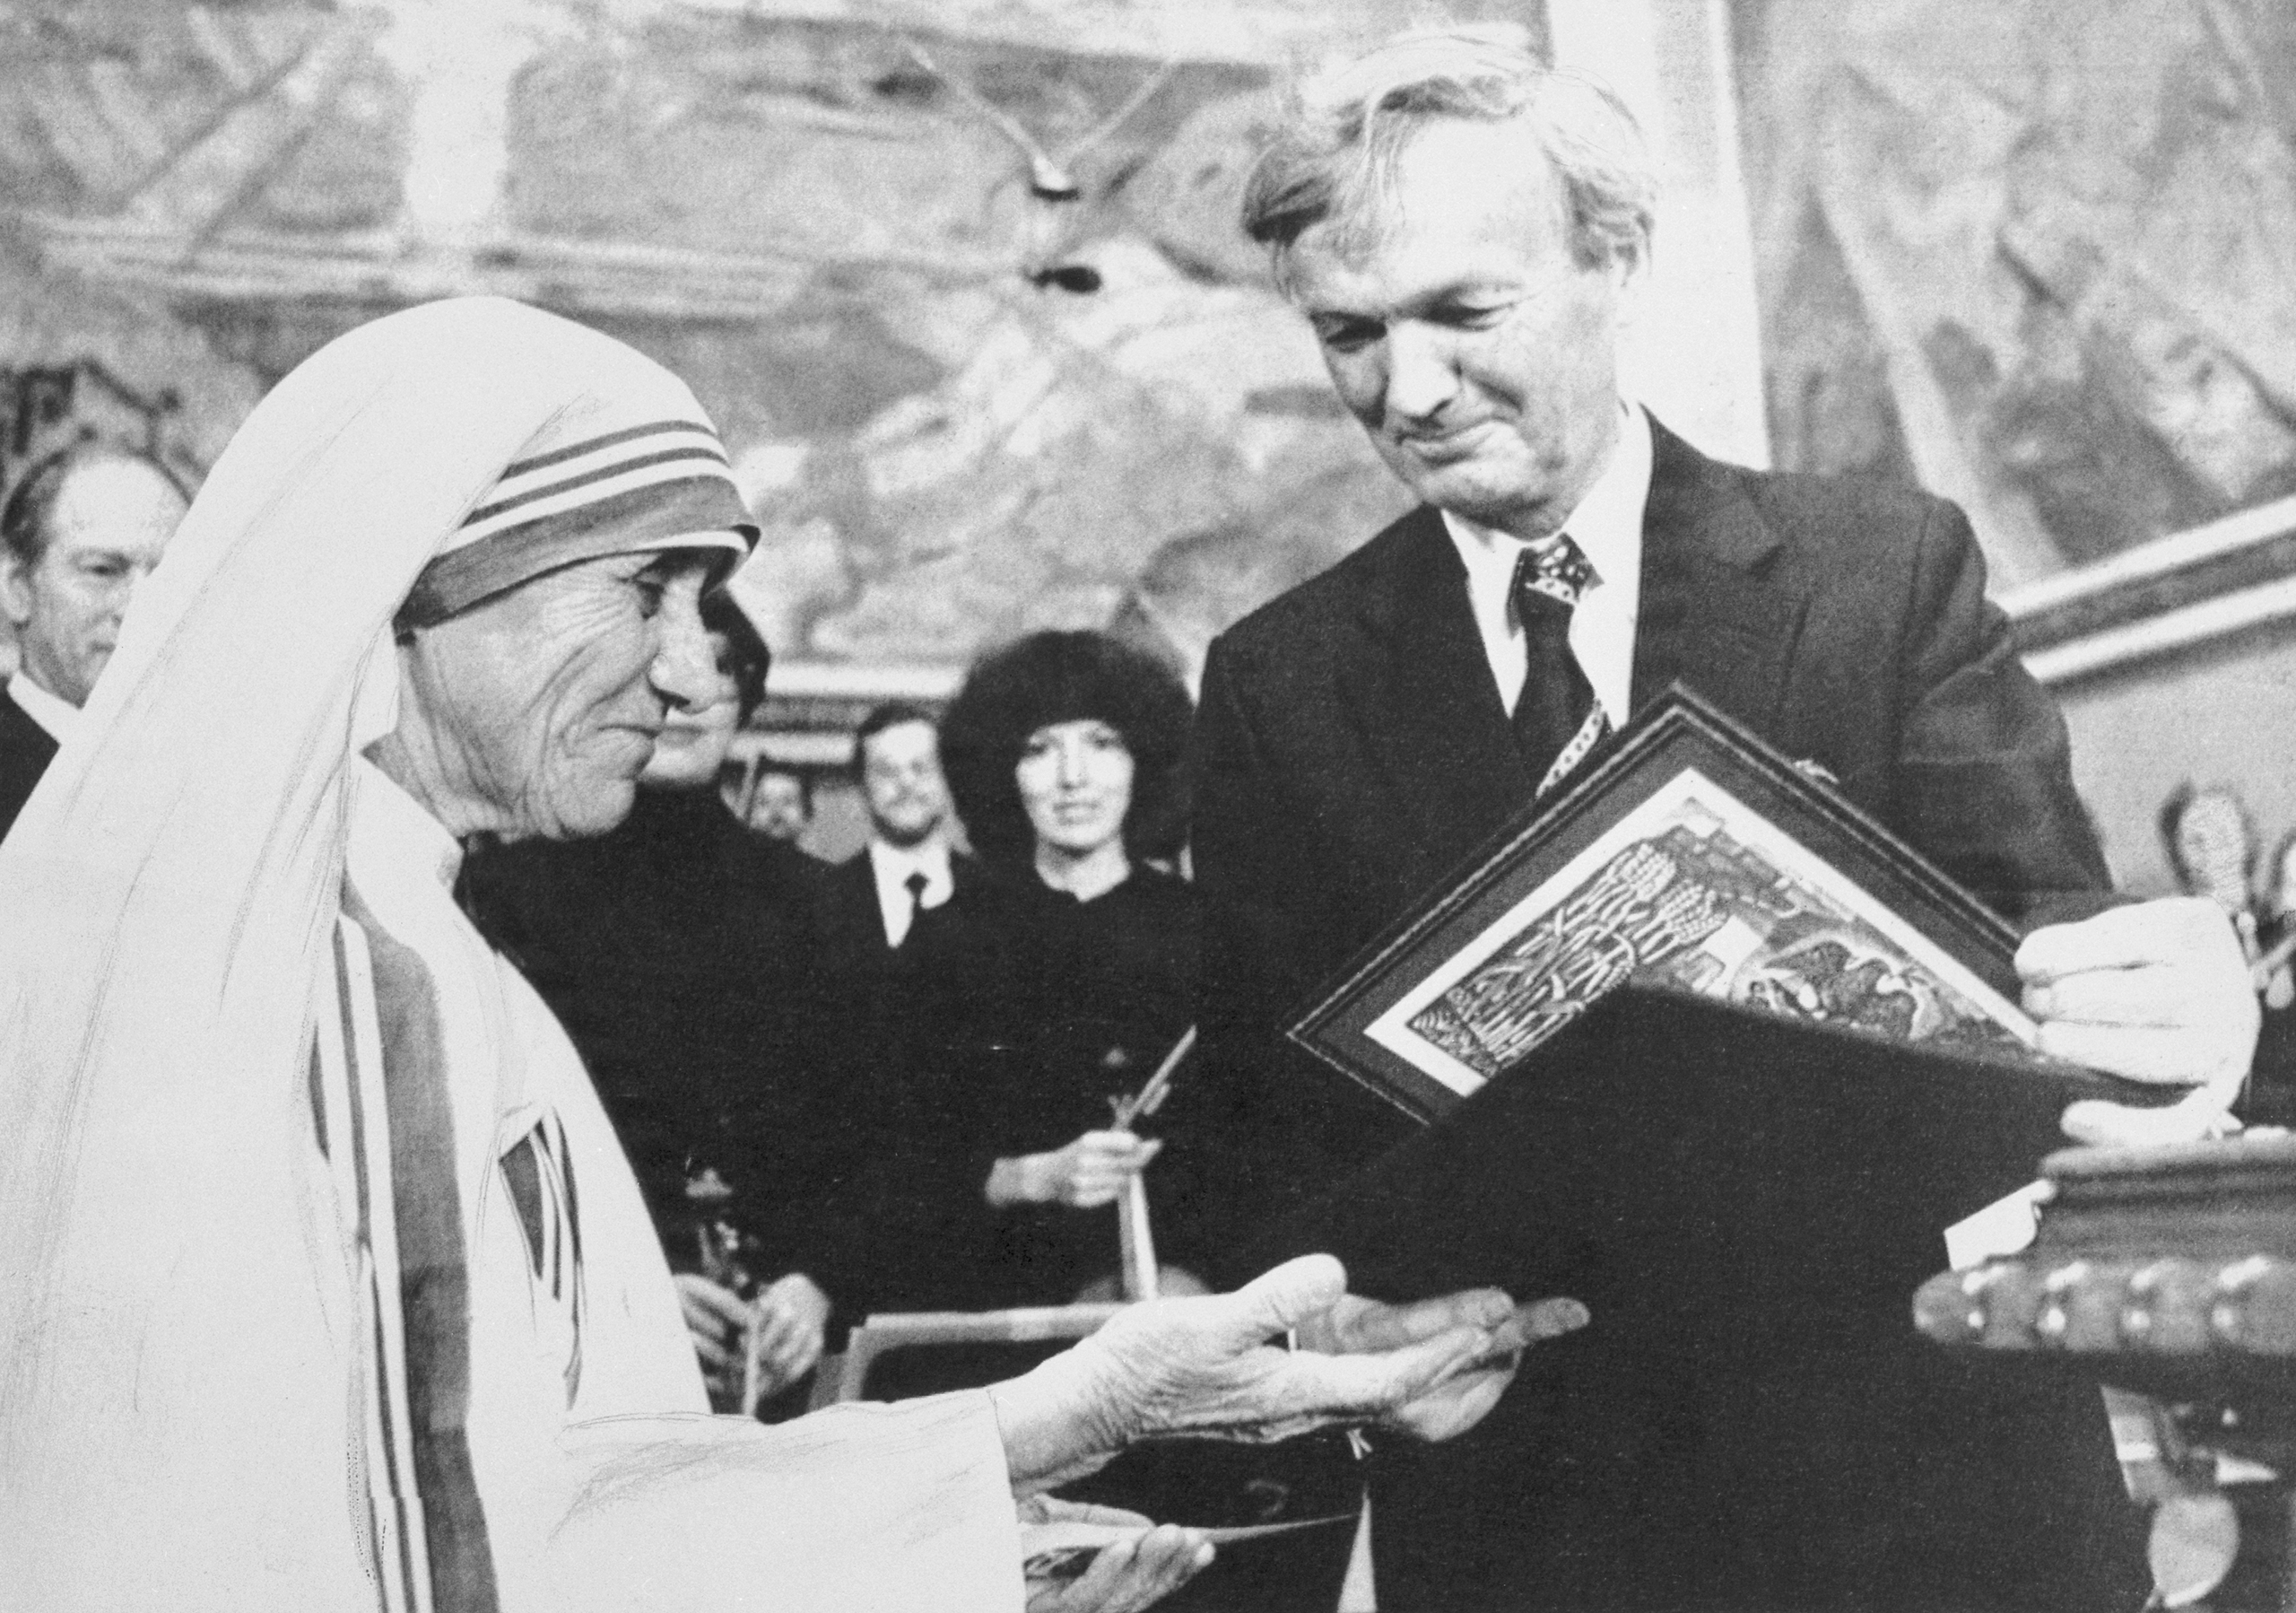 Chairman of the Norwegian Nobel Institute, Prof. John Sanness, hands over the 1979  Nobel Peace Prize to Mother Teresa.